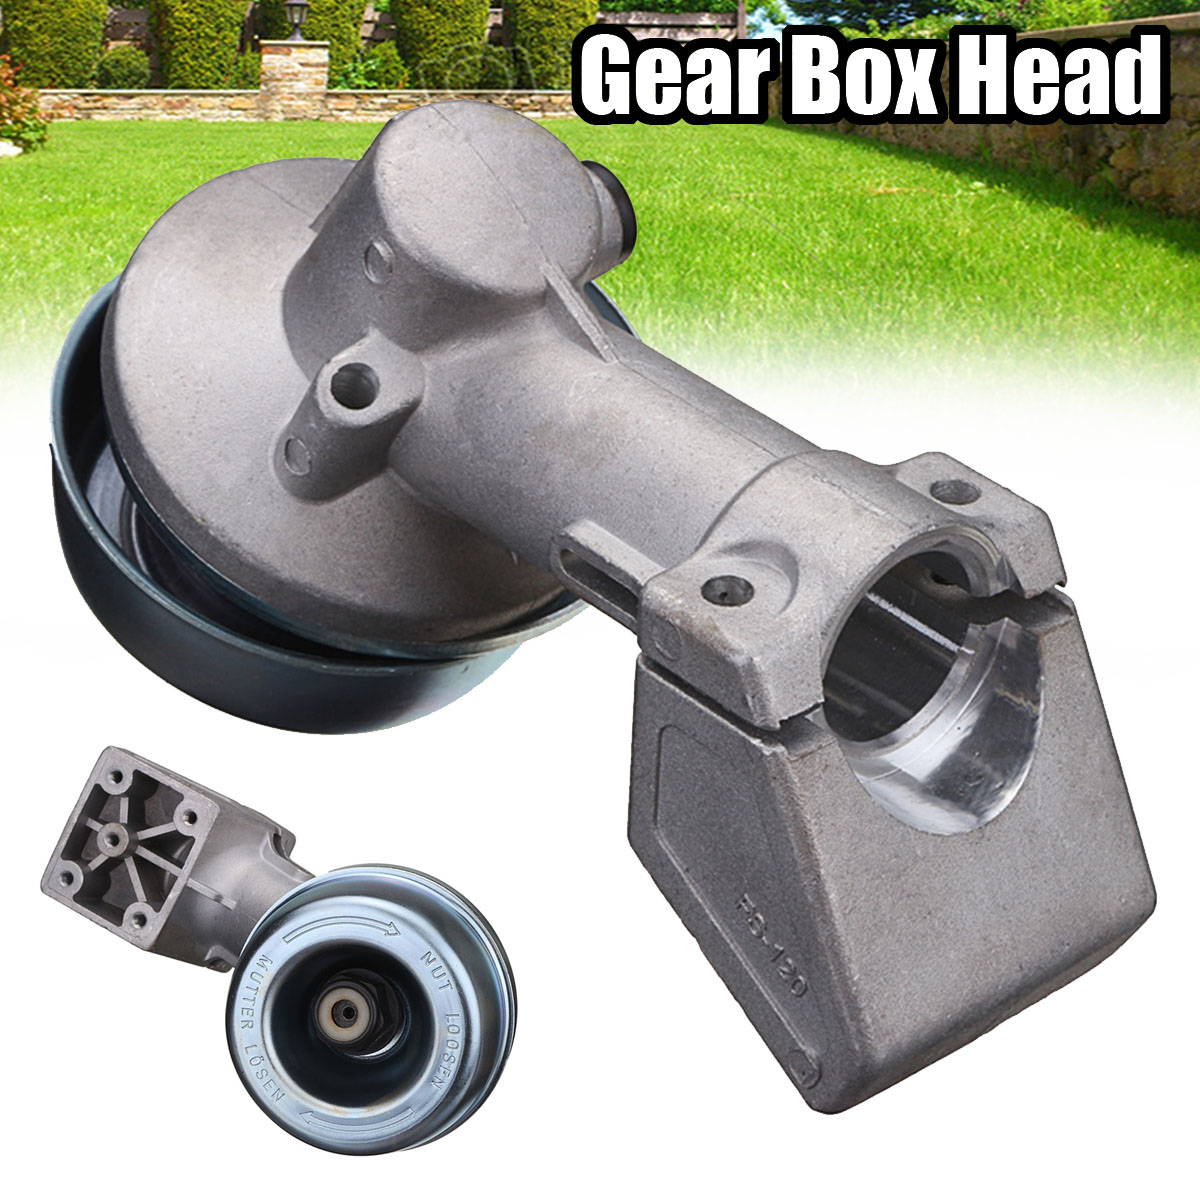 Image 5 - New Gear Box Head Replacement Fit Grass Trimmer Brush Cutter for STIHL FS44 FS55 FS72 FS74 FS75 FS76 FS80 FS85 FS90 FS100 FS110-in Tool Parts from Tools